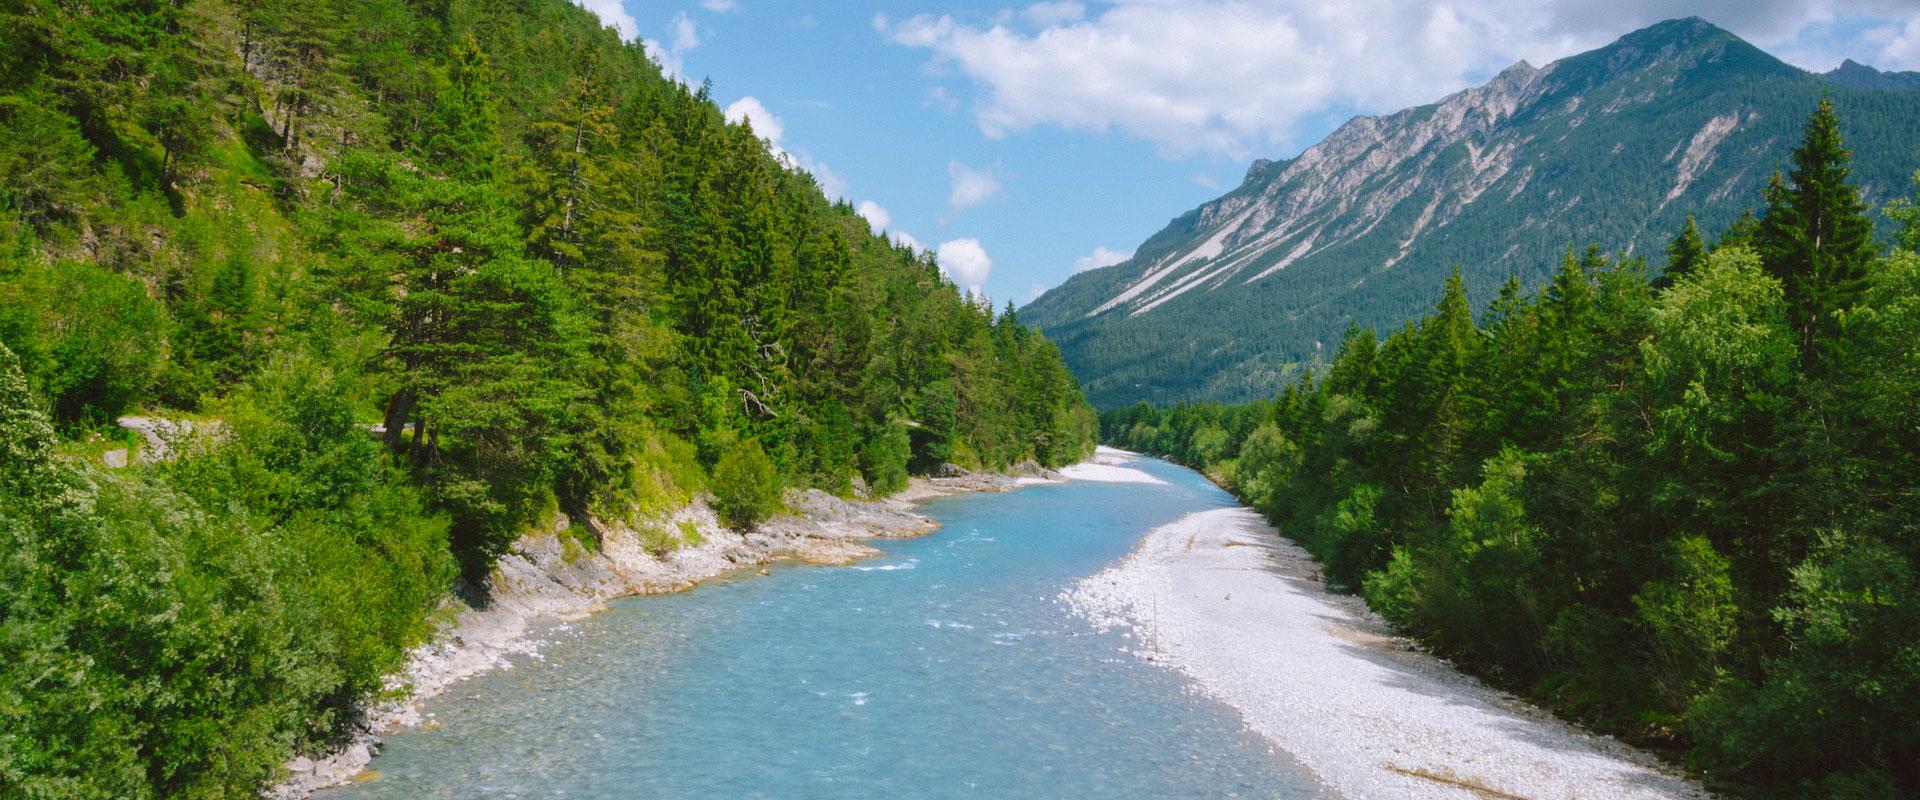 Alps: Lech River Trail